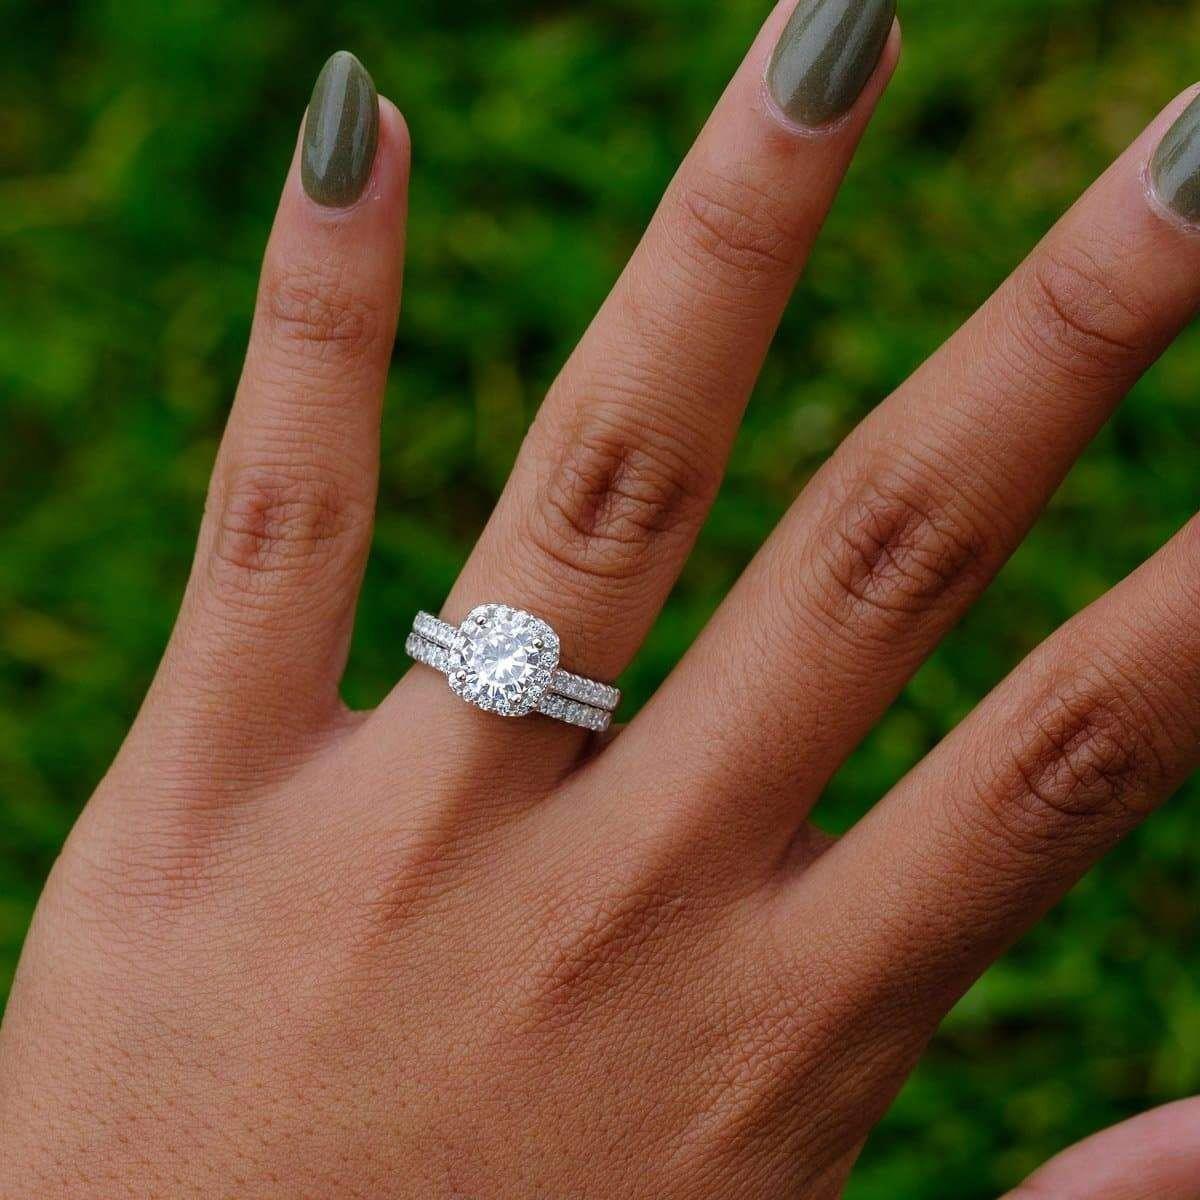 Moonstone engagement ring rose gold Vintage engagement ring Oval diamond wedding women Unique Design Three stone Bridal Anniversary Gift - Fine Jewelry Ideas